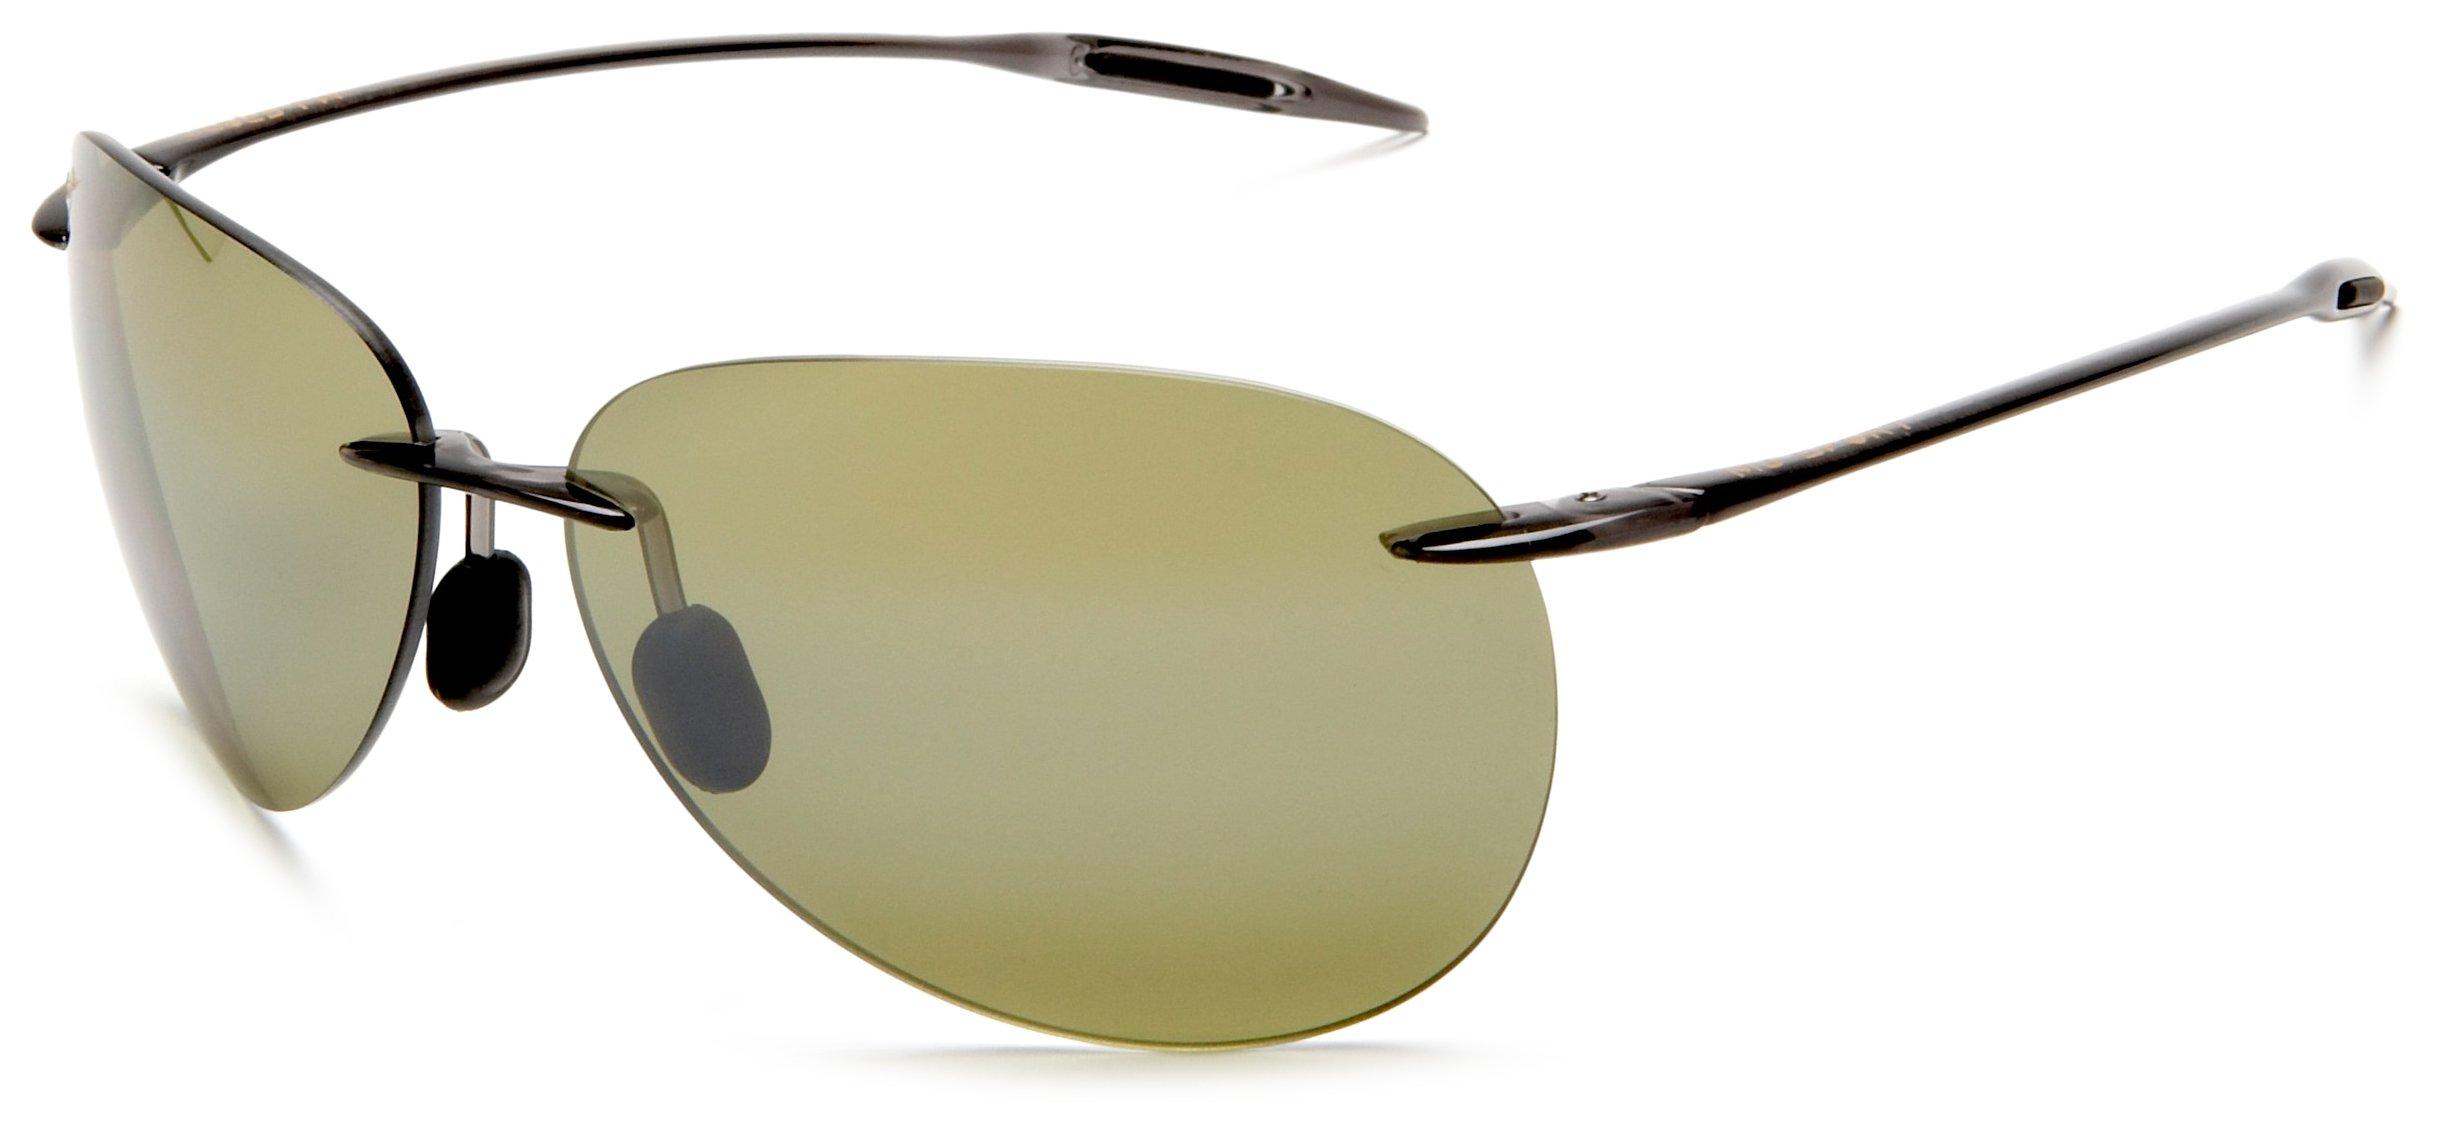 Maui Jim Sunglasses - Sugar Beach / Frame: Smoke Gray Lens: Polarized Maui HT